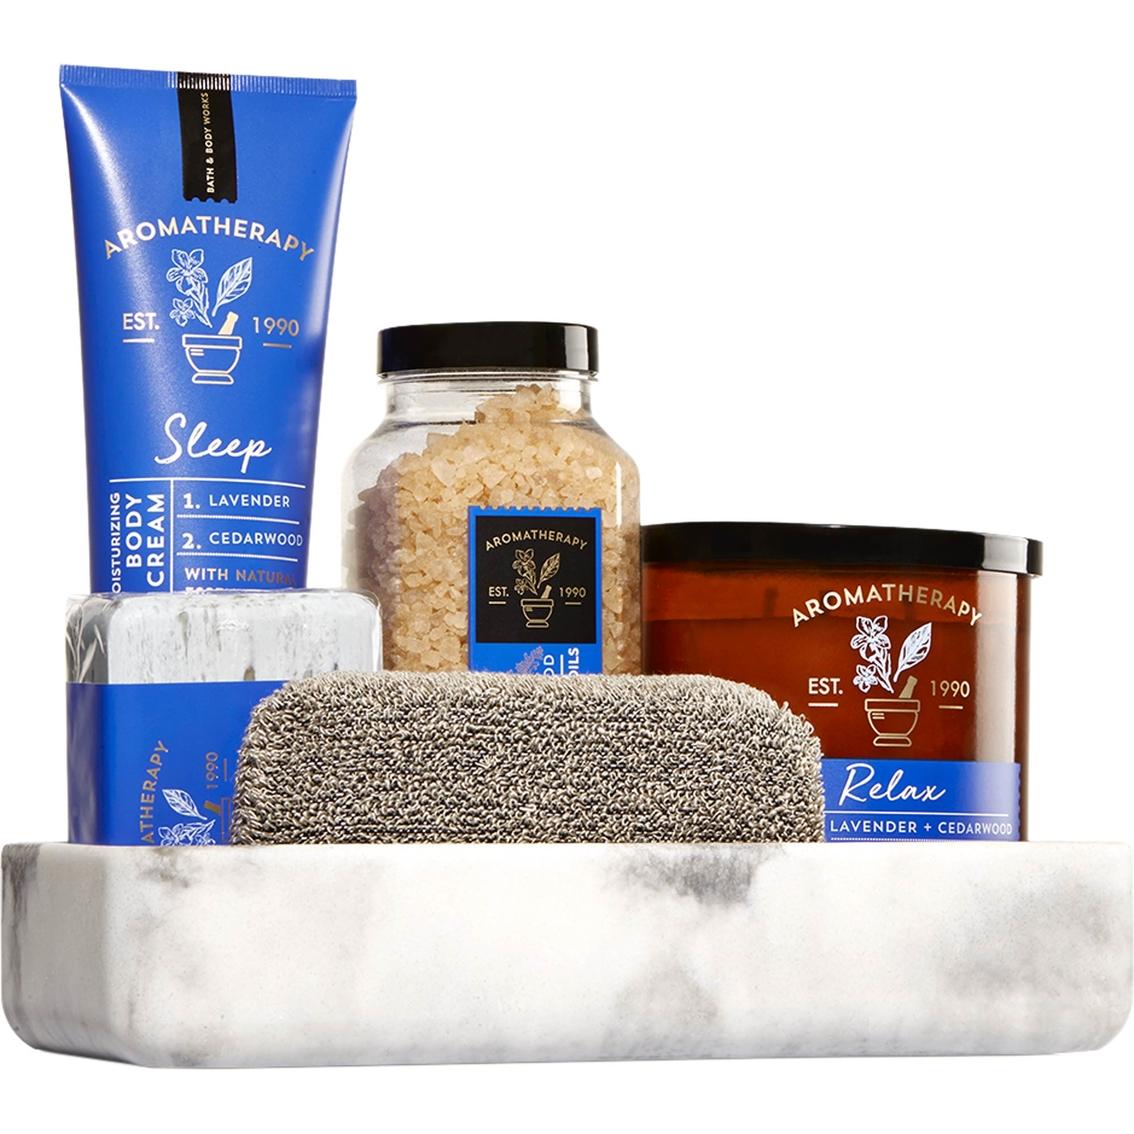 Bath Body Works Lavender Cedarwood Aromatherapy Bath Kit